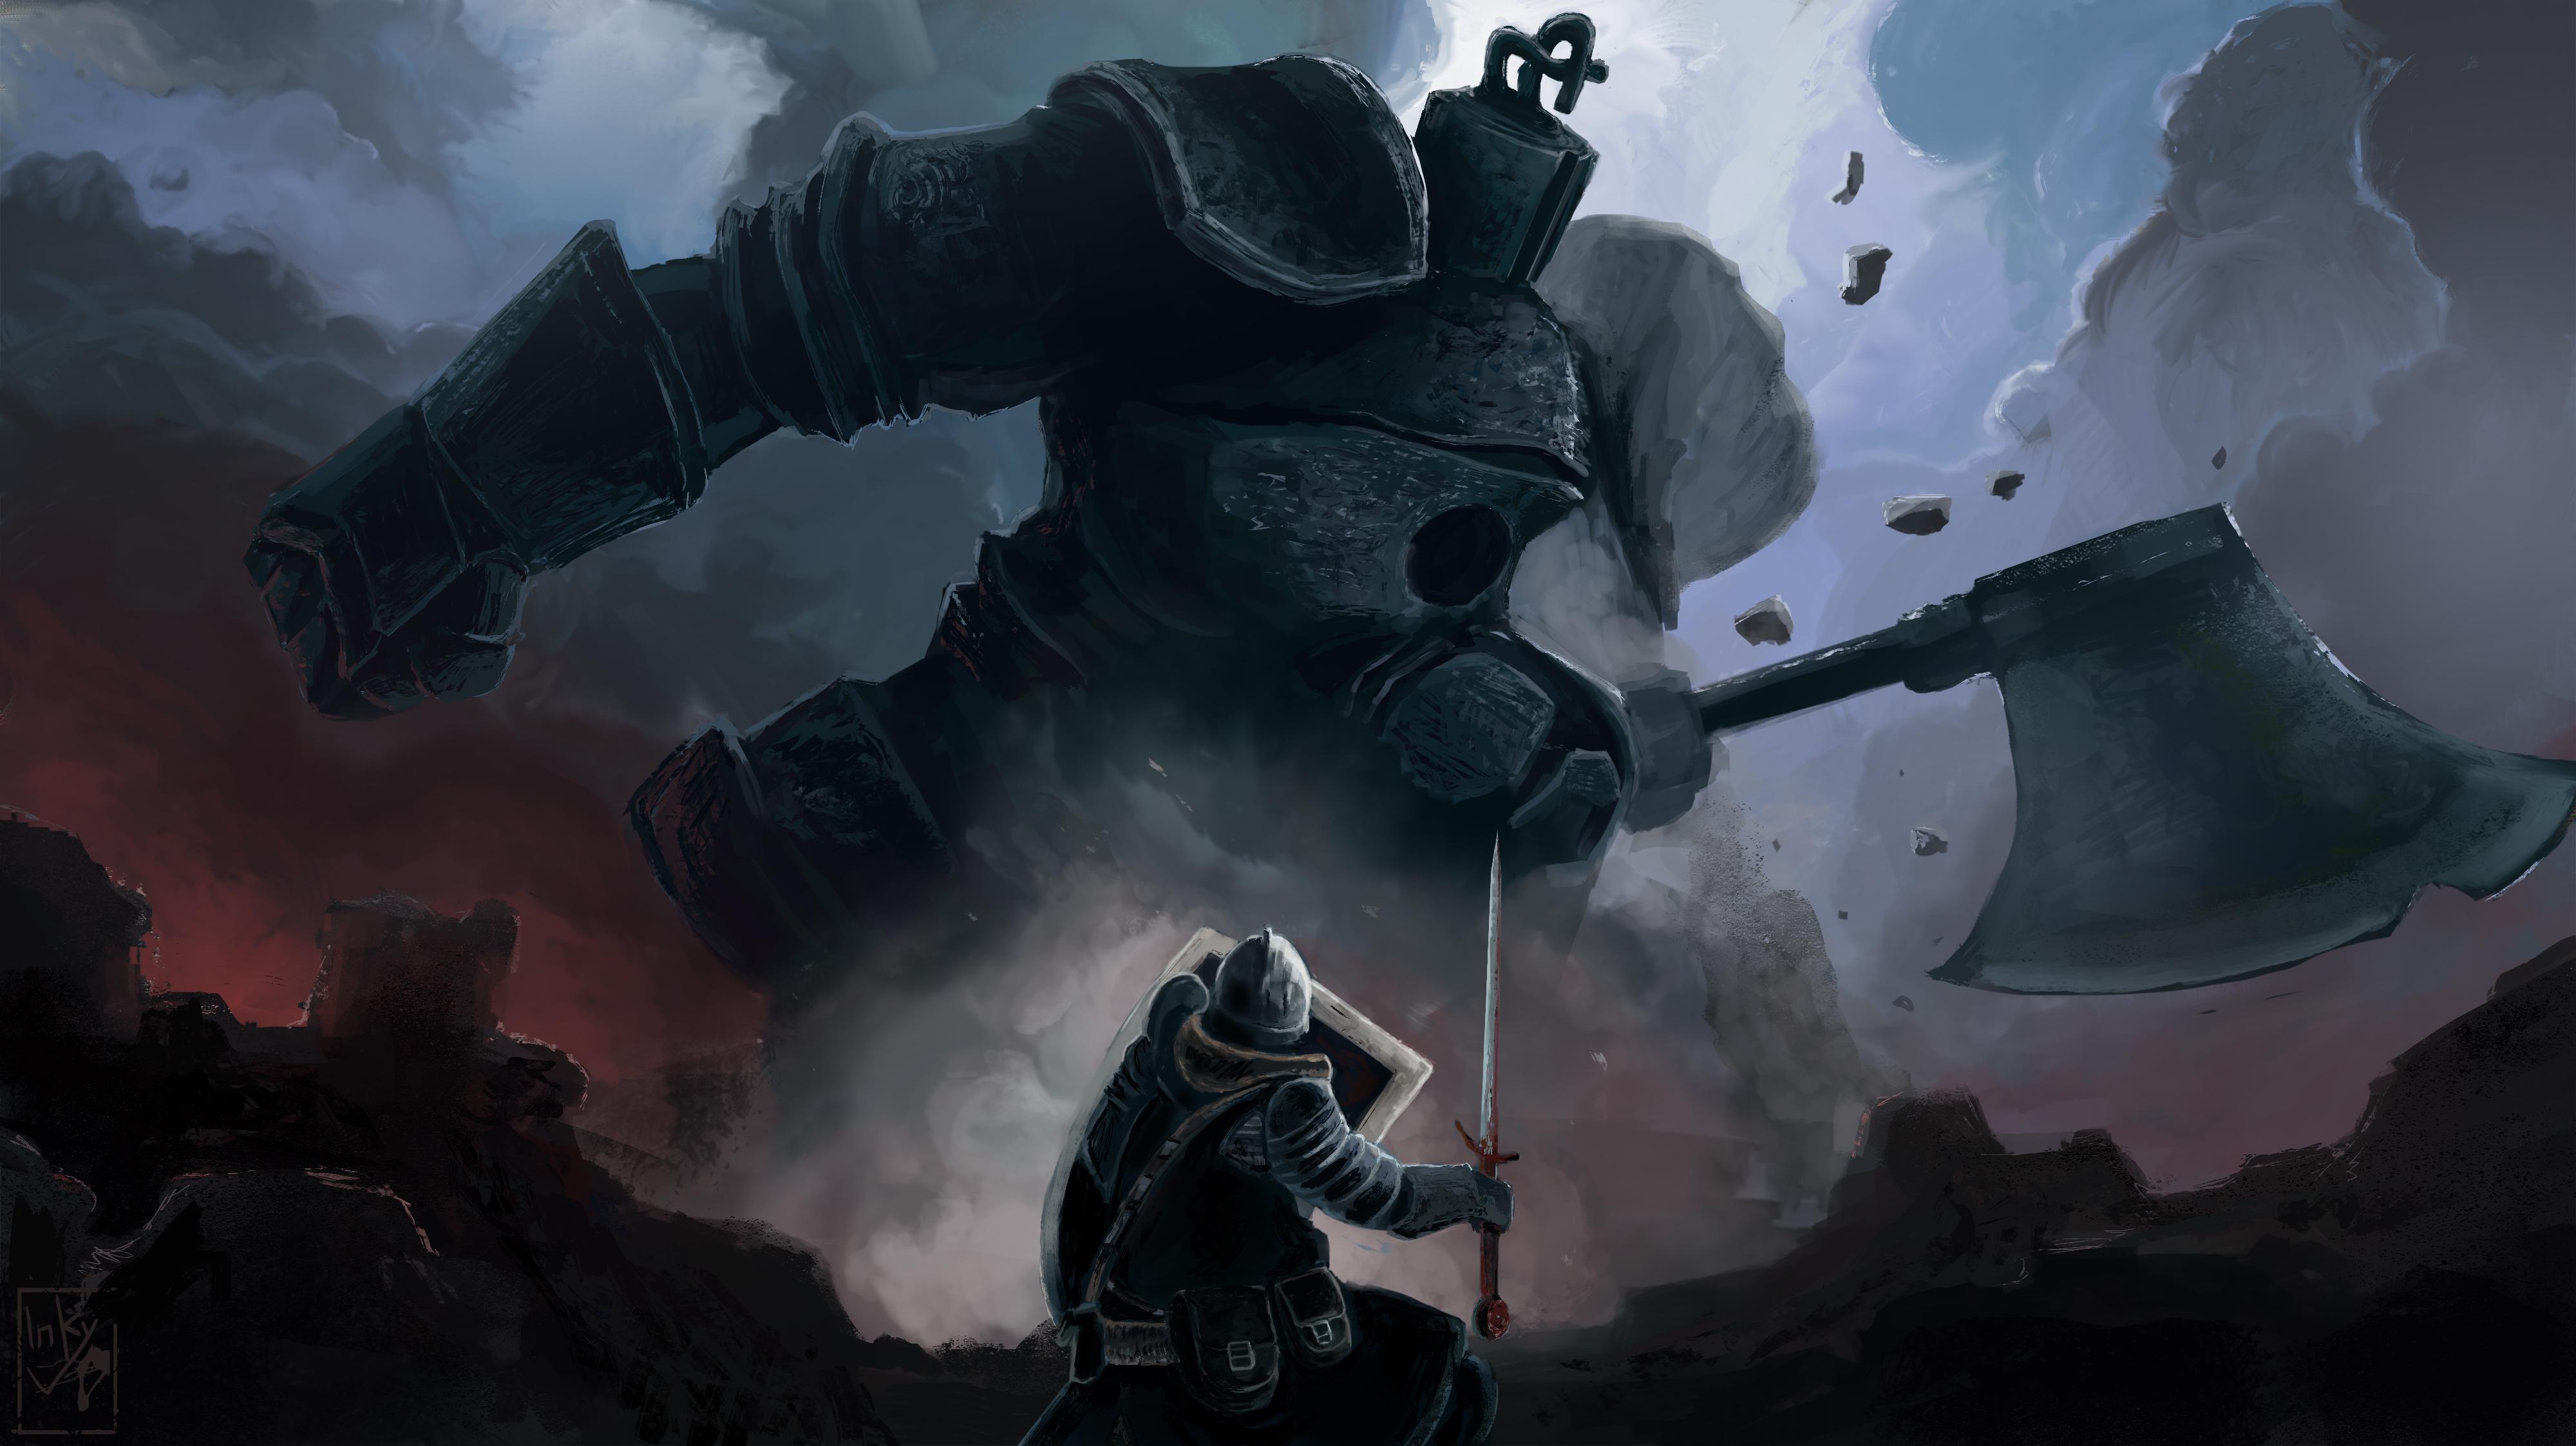 205 Dark Souls III HD Wallpapers | Backgrounds - Wallpaper Abyss